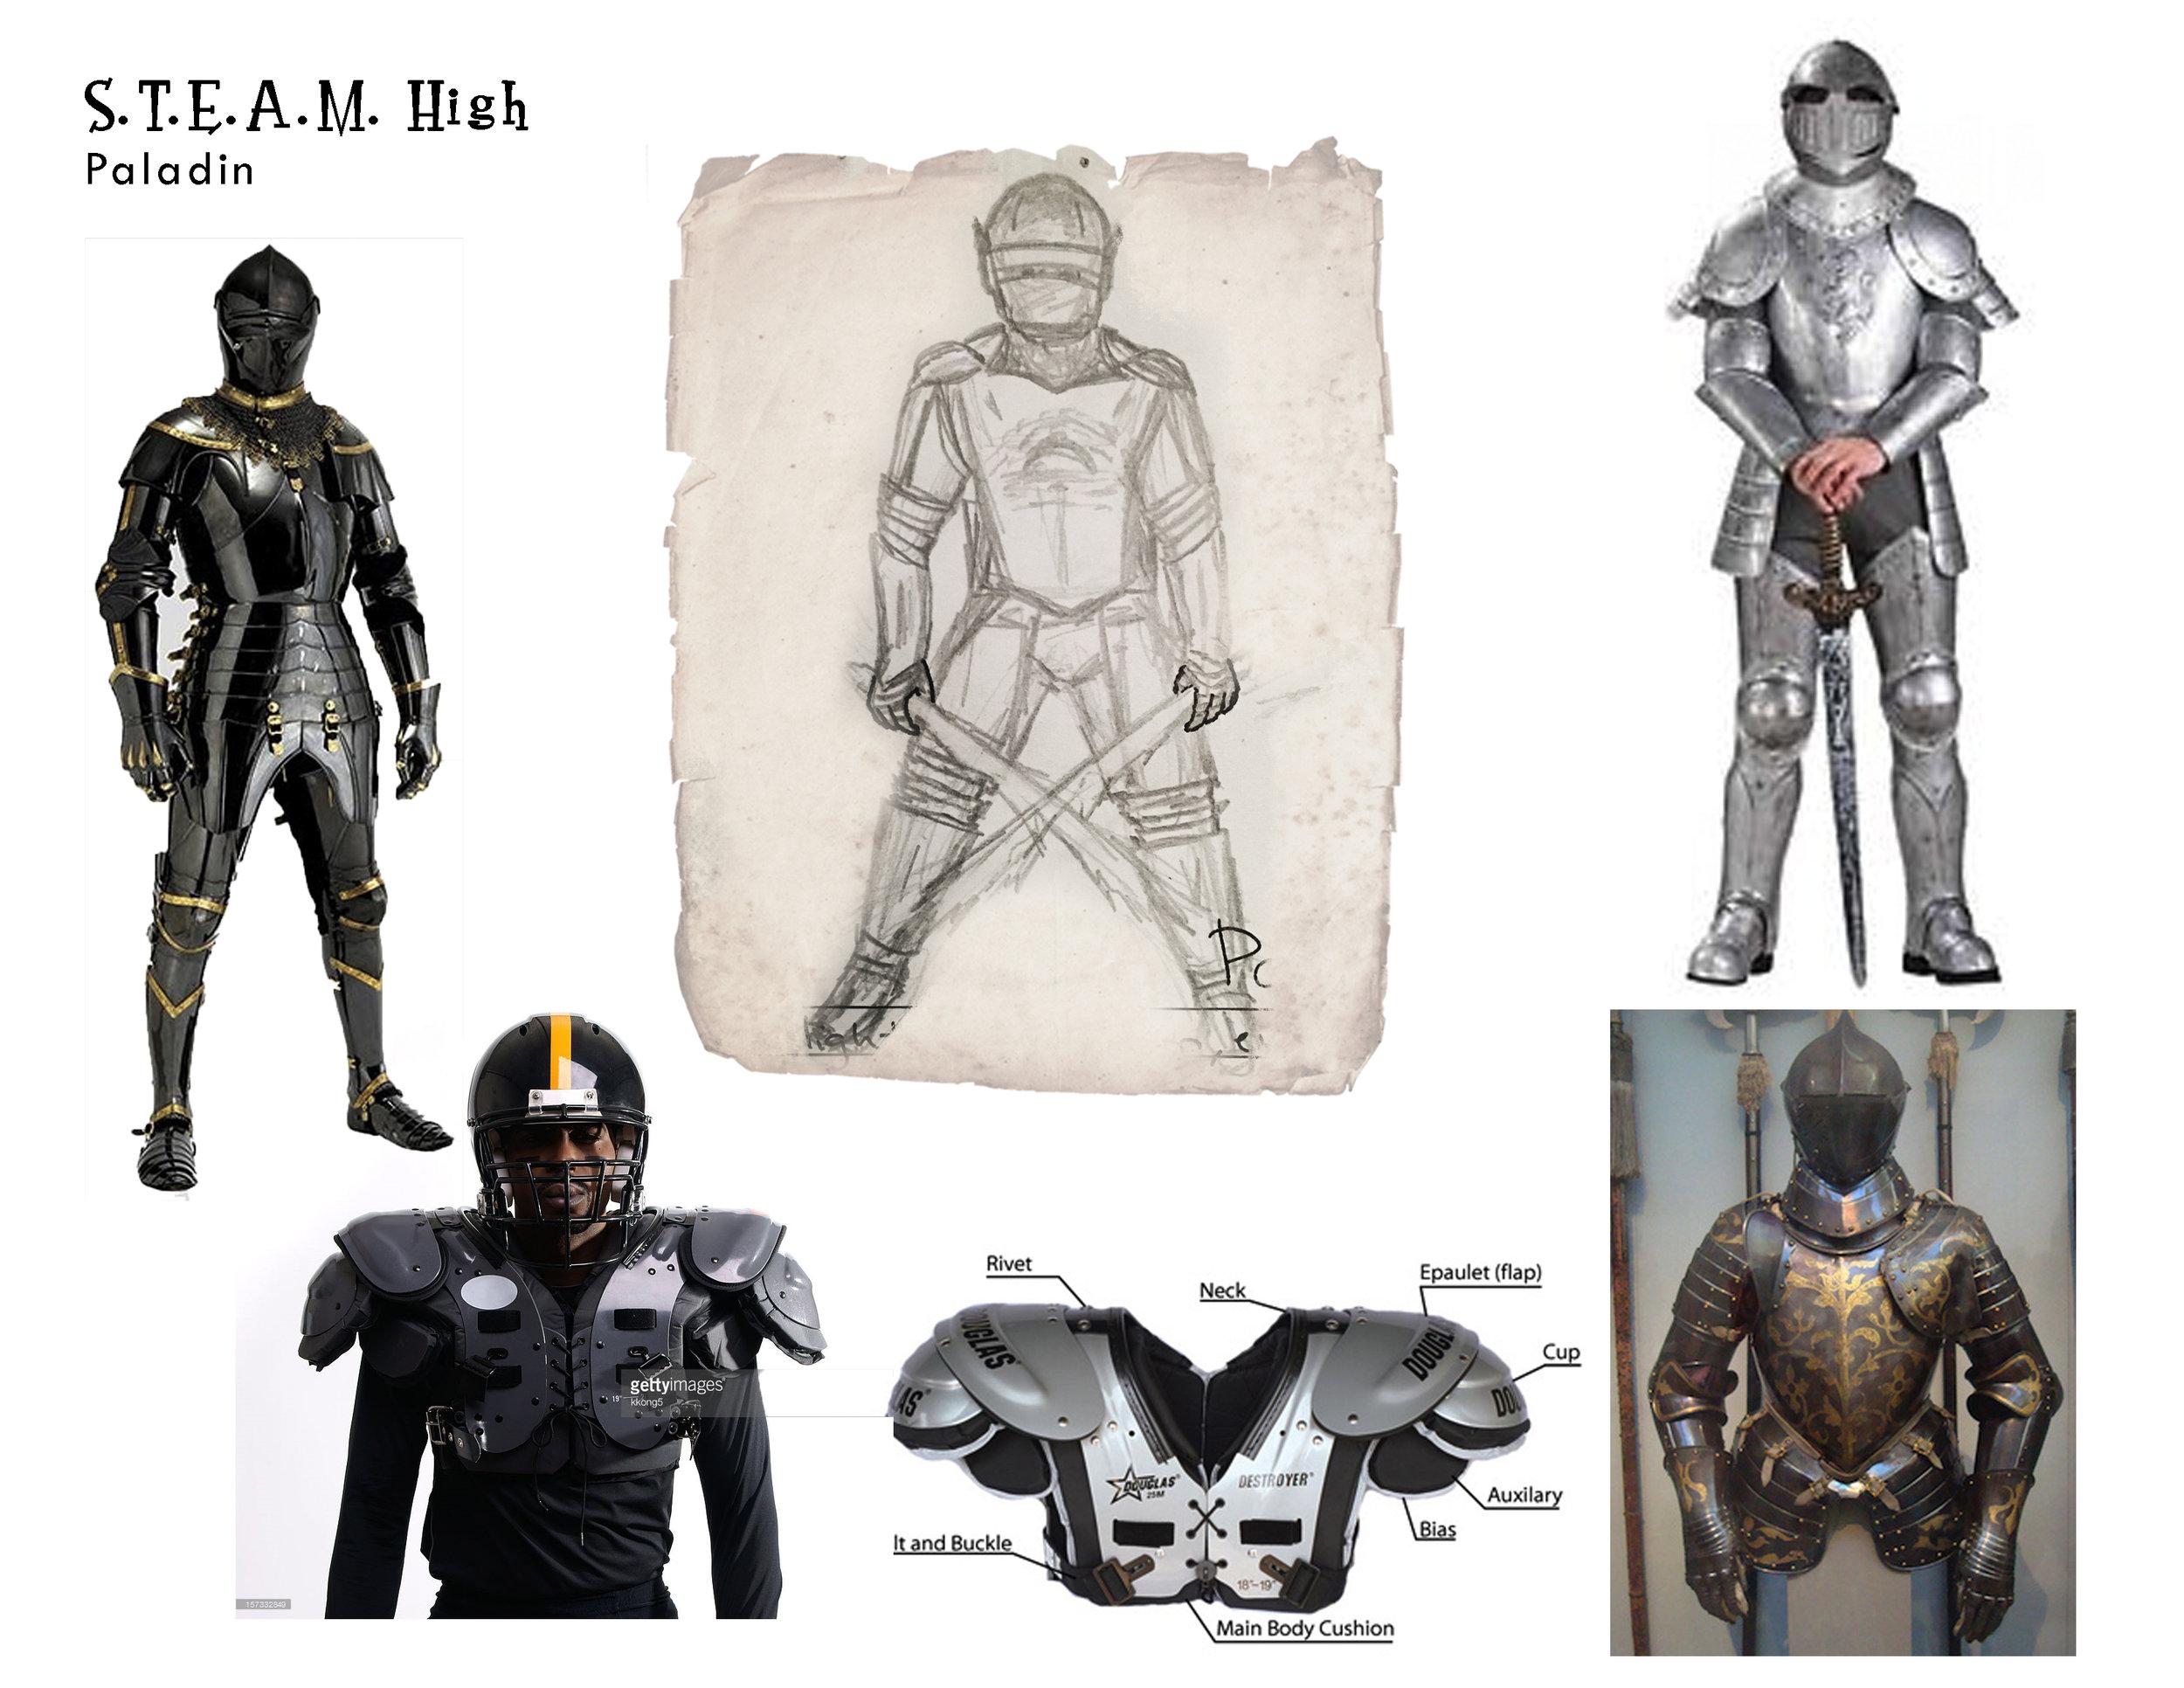 S.T.E.A.M. High Paladin Concept.jpg